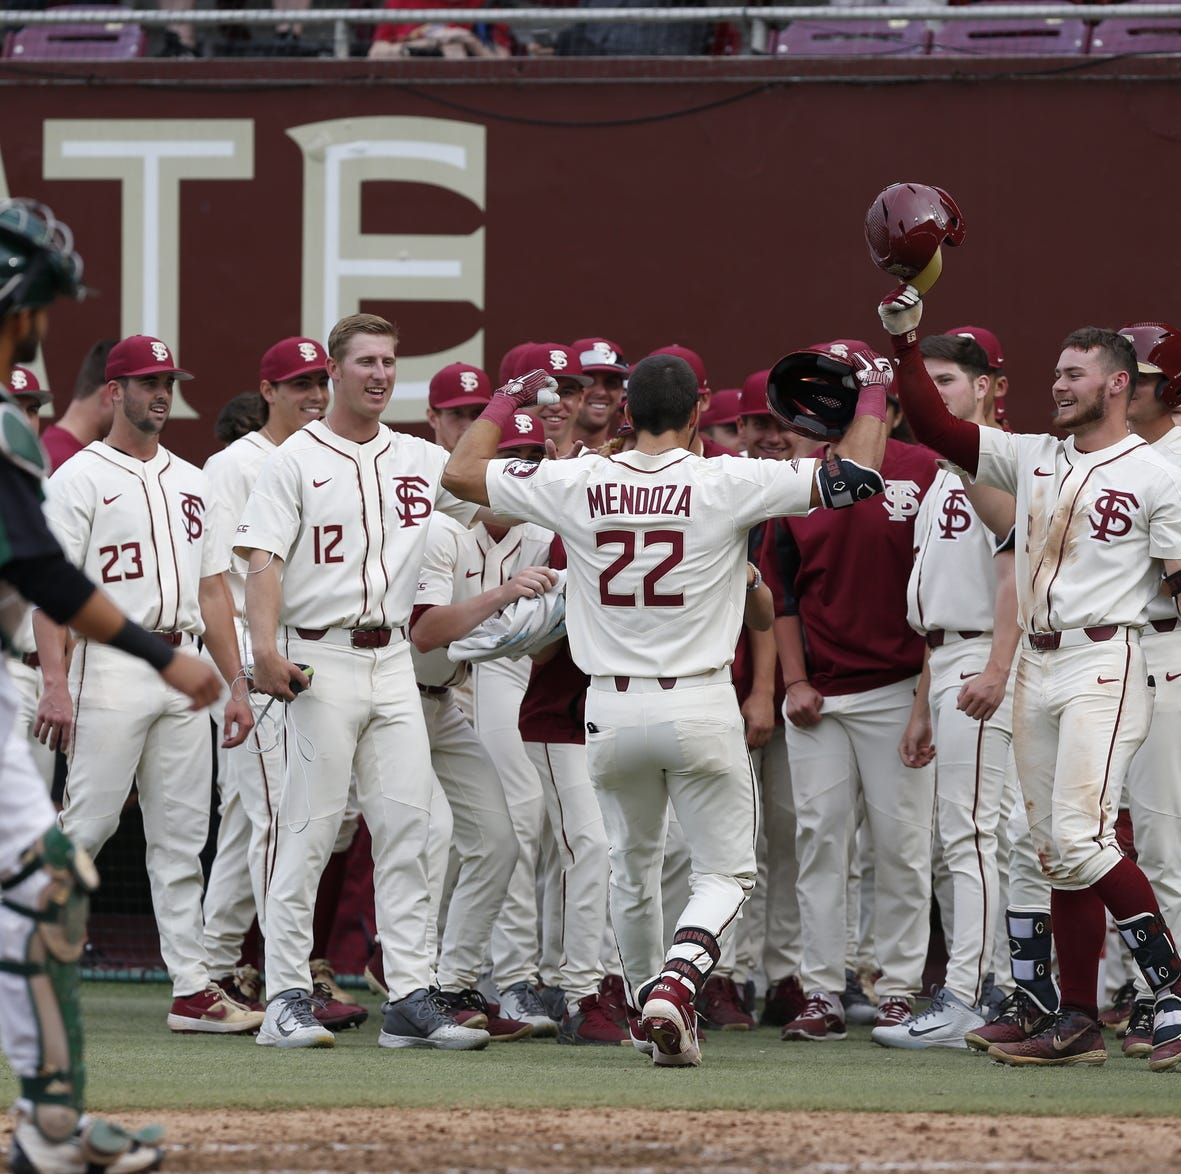 Florida State baseball keeps winning, completes midweek sweep of Stetson